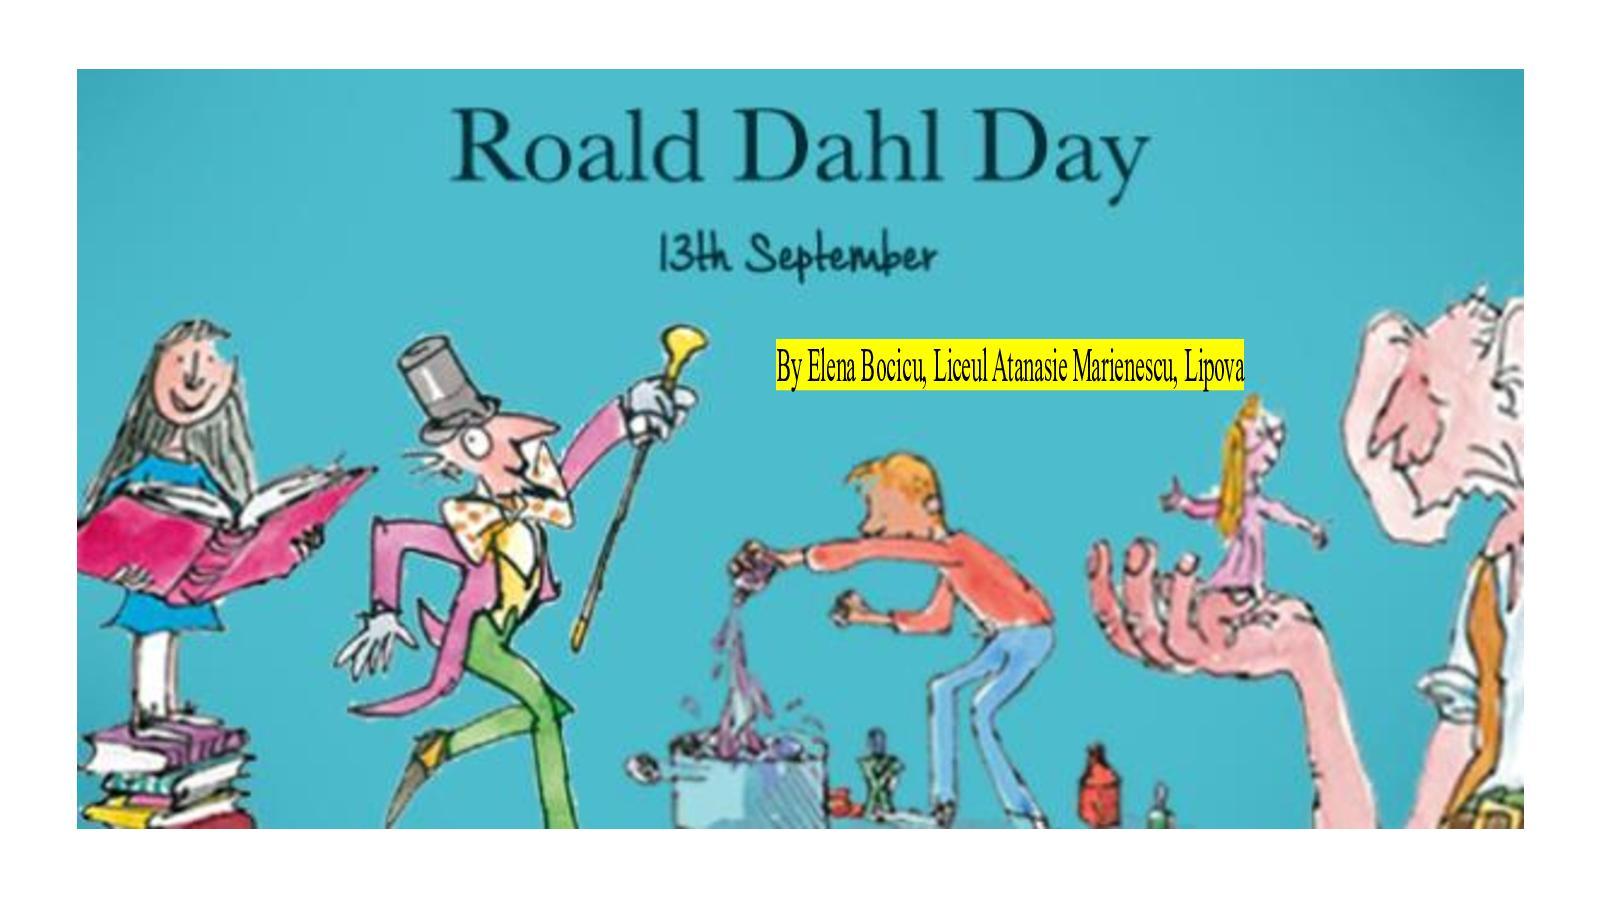 Calaméo Roald Dahl Day 2019 By Elena Bocicu